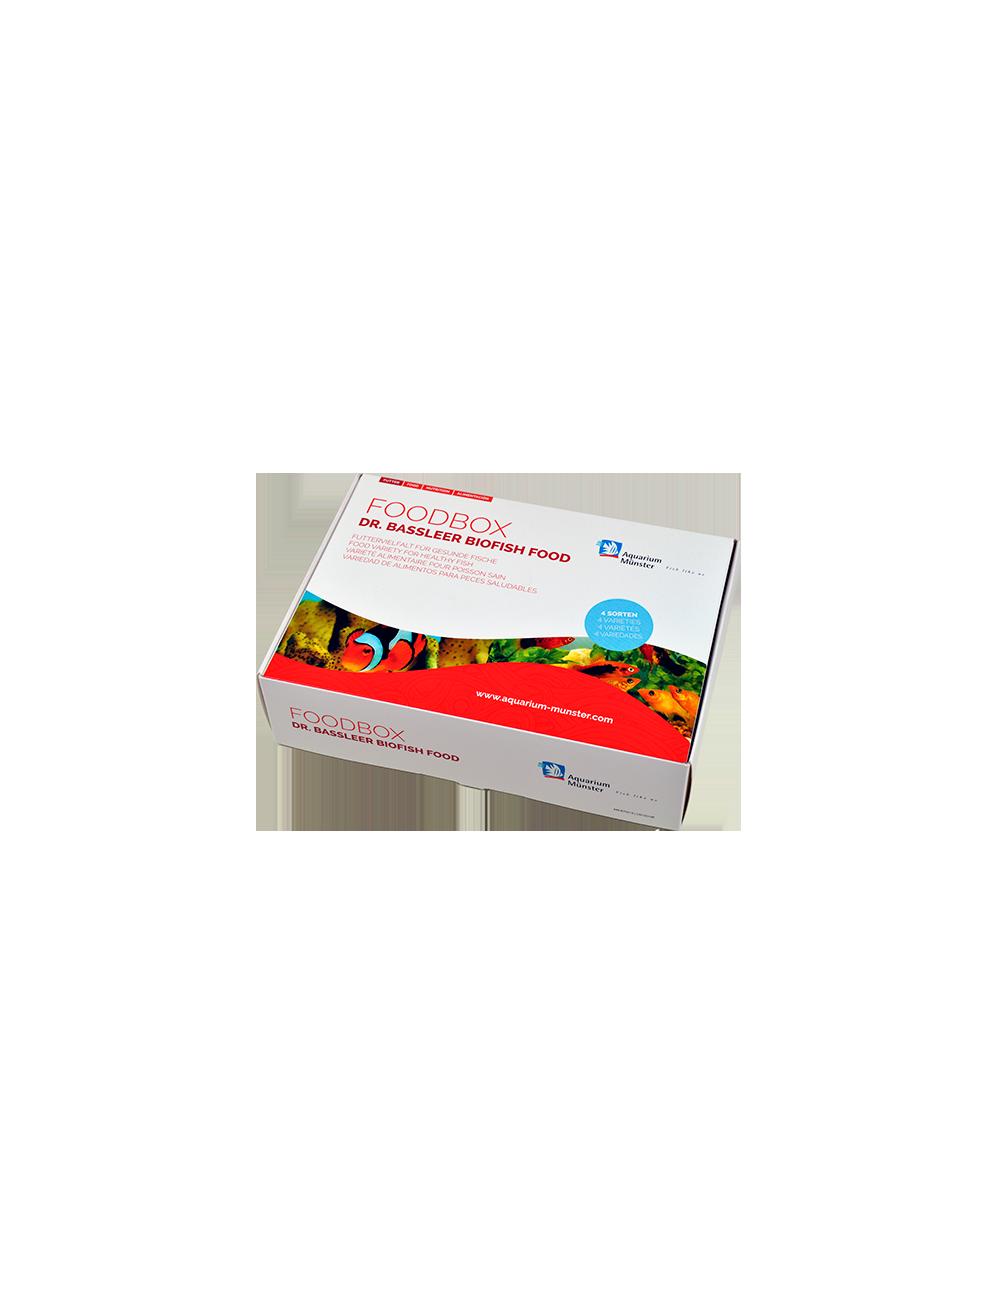 Dr. Bassleer BIOFISH Foodbox - M - Box nourriture pour poissons